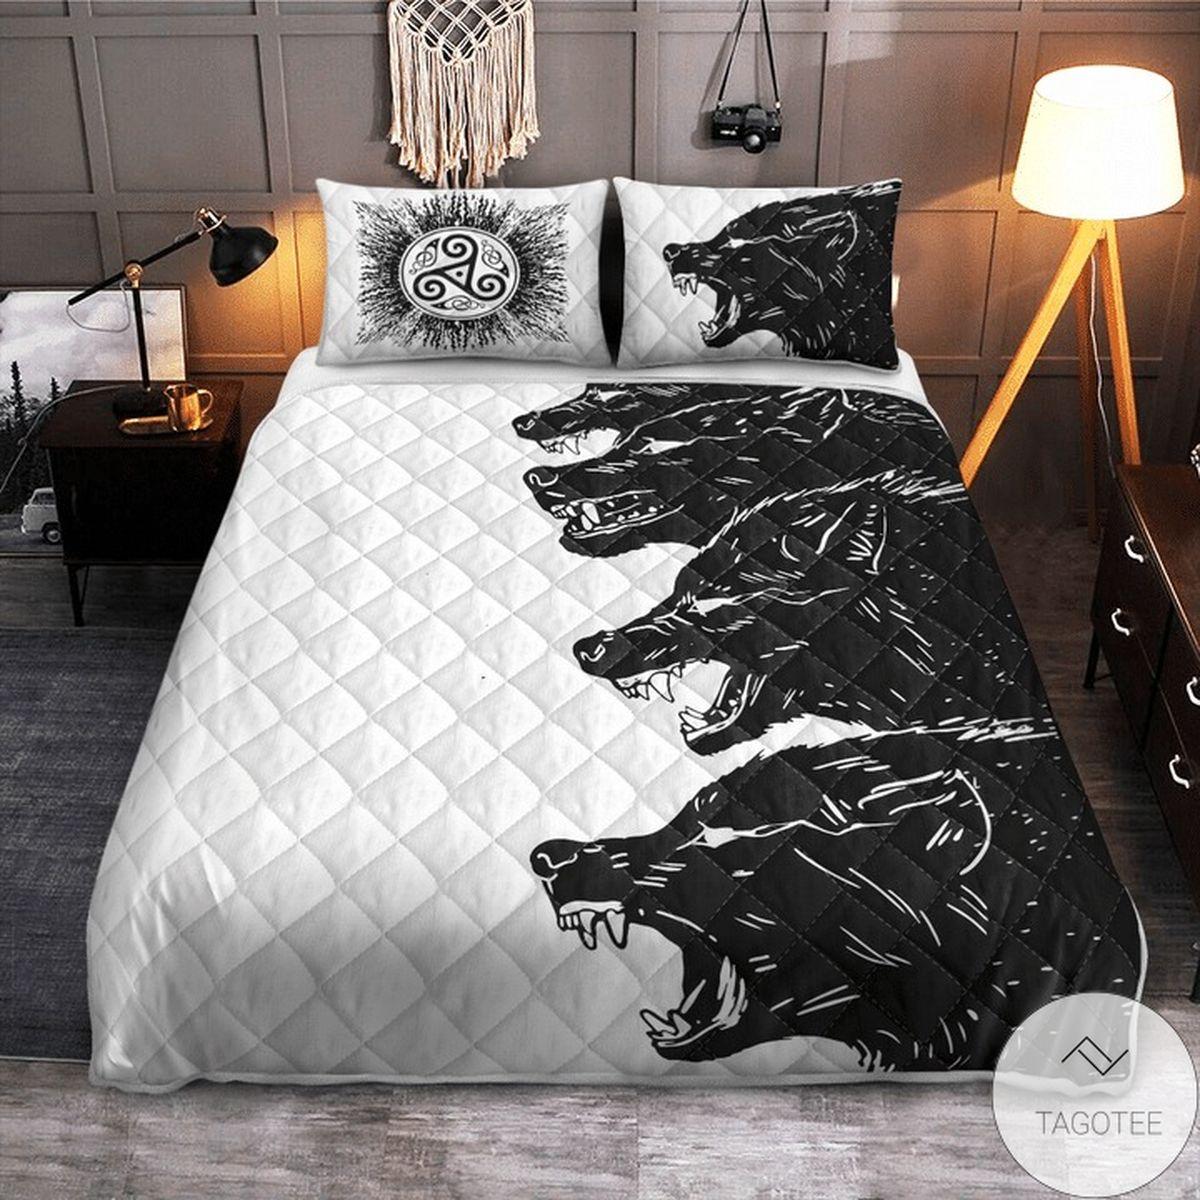 Adult Wolves Black And White Quilt Bedding Set